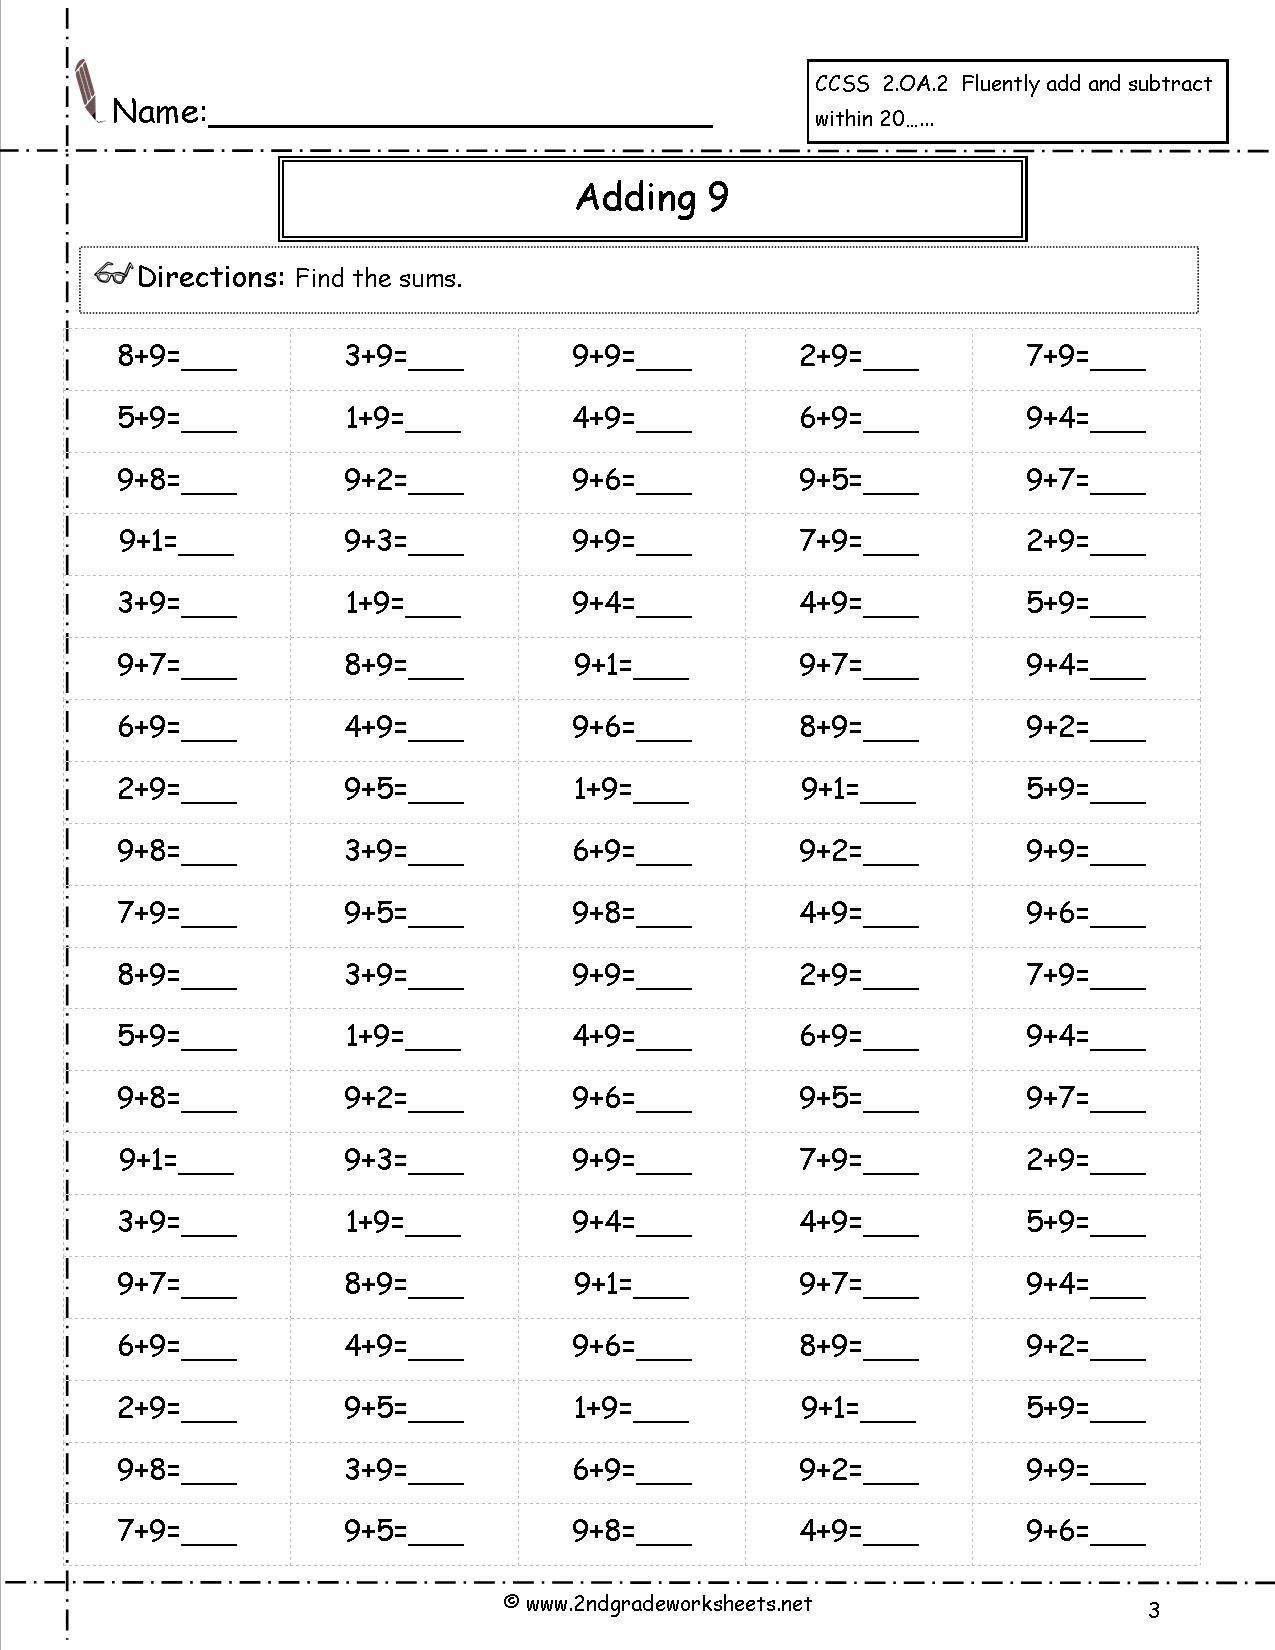 small resolution of Adding 9 worksheet   1st grade math